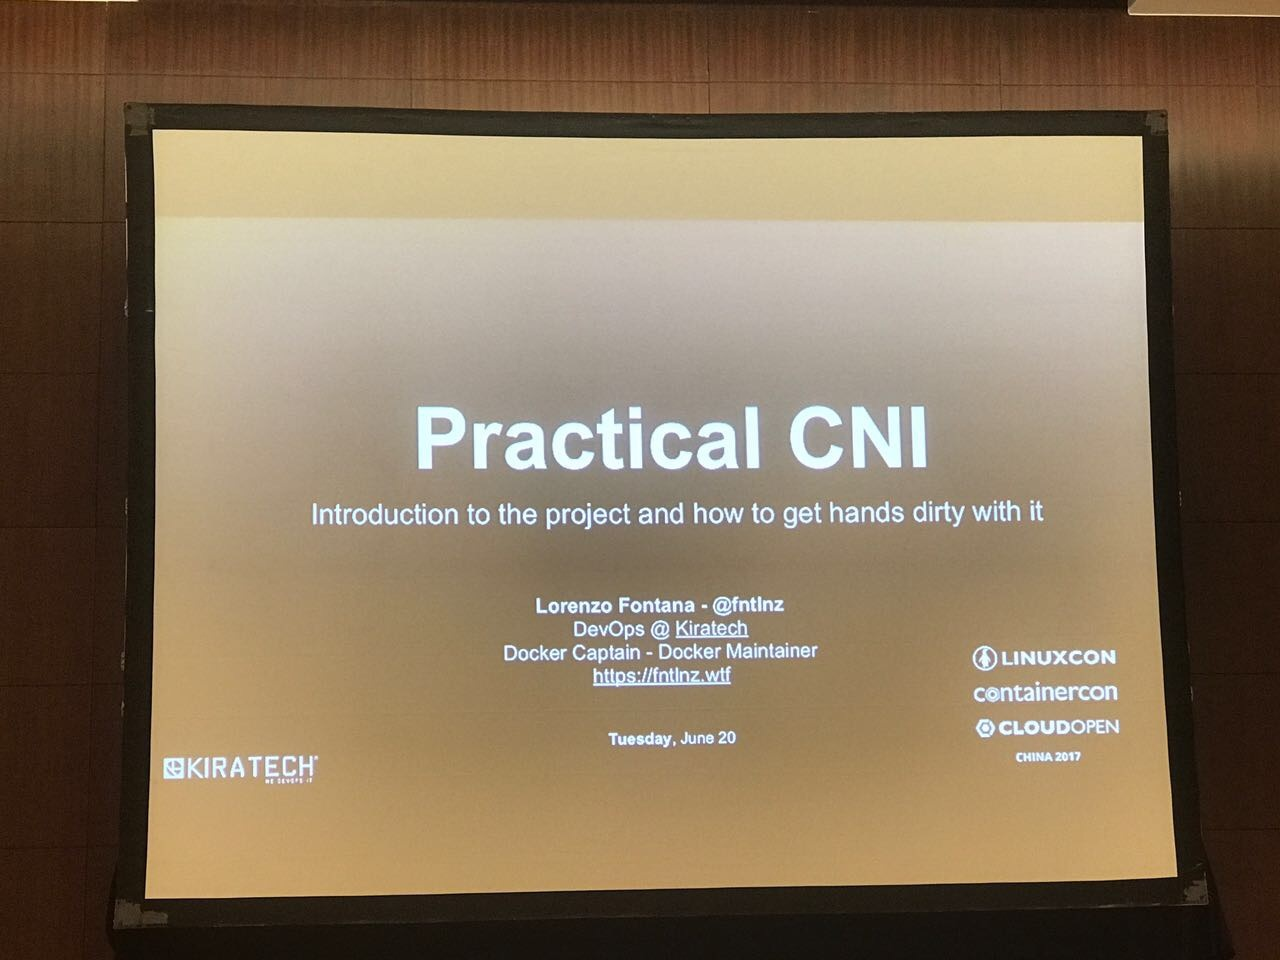 Practical-Container-Network-Interface-Lorenzo-Fontana.jpg